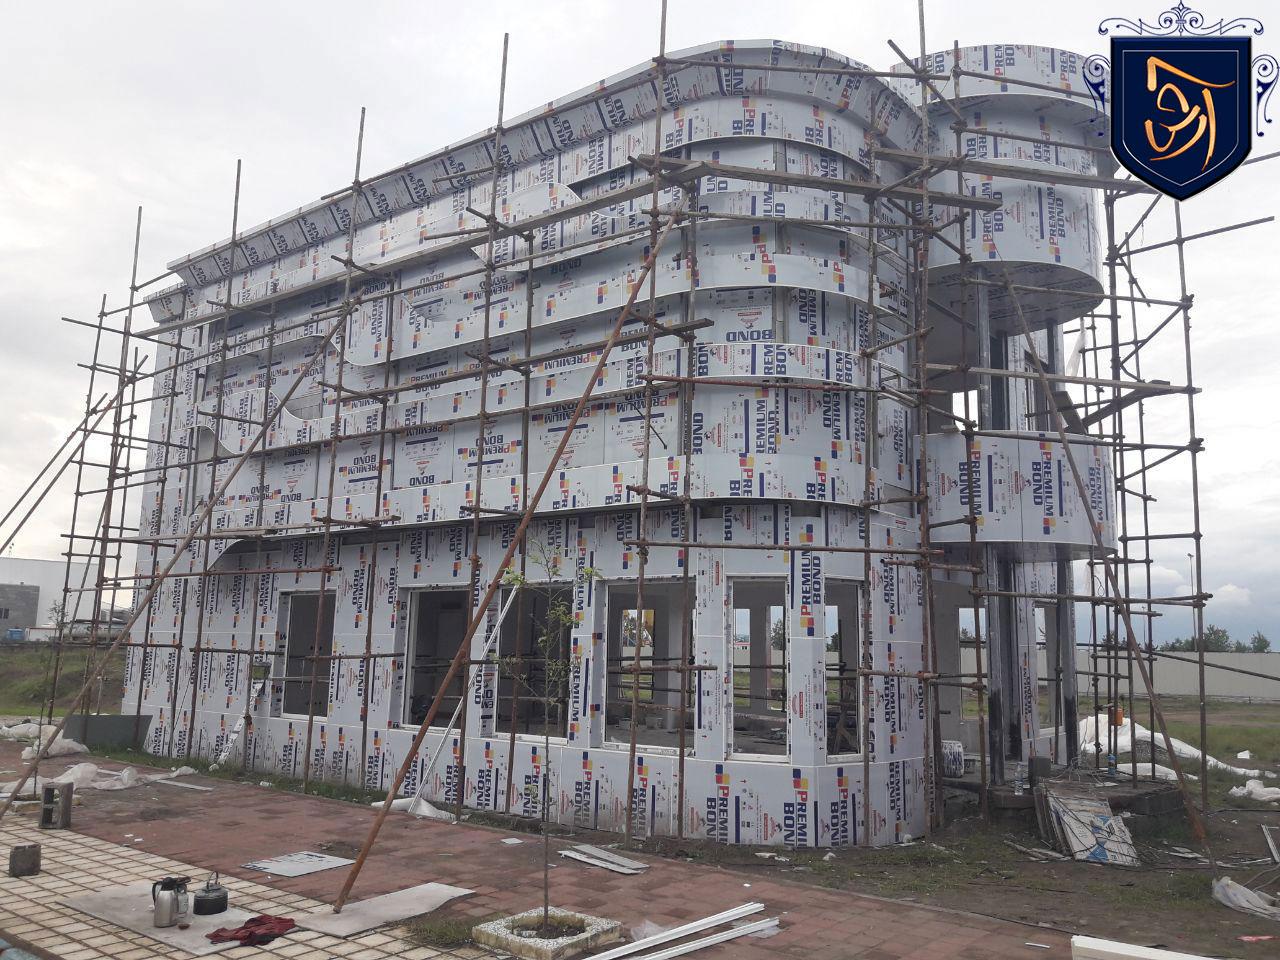 new1 - مراحل پایانی احداث ساختمان اداری آرش مال منطقه آزاد انزلی